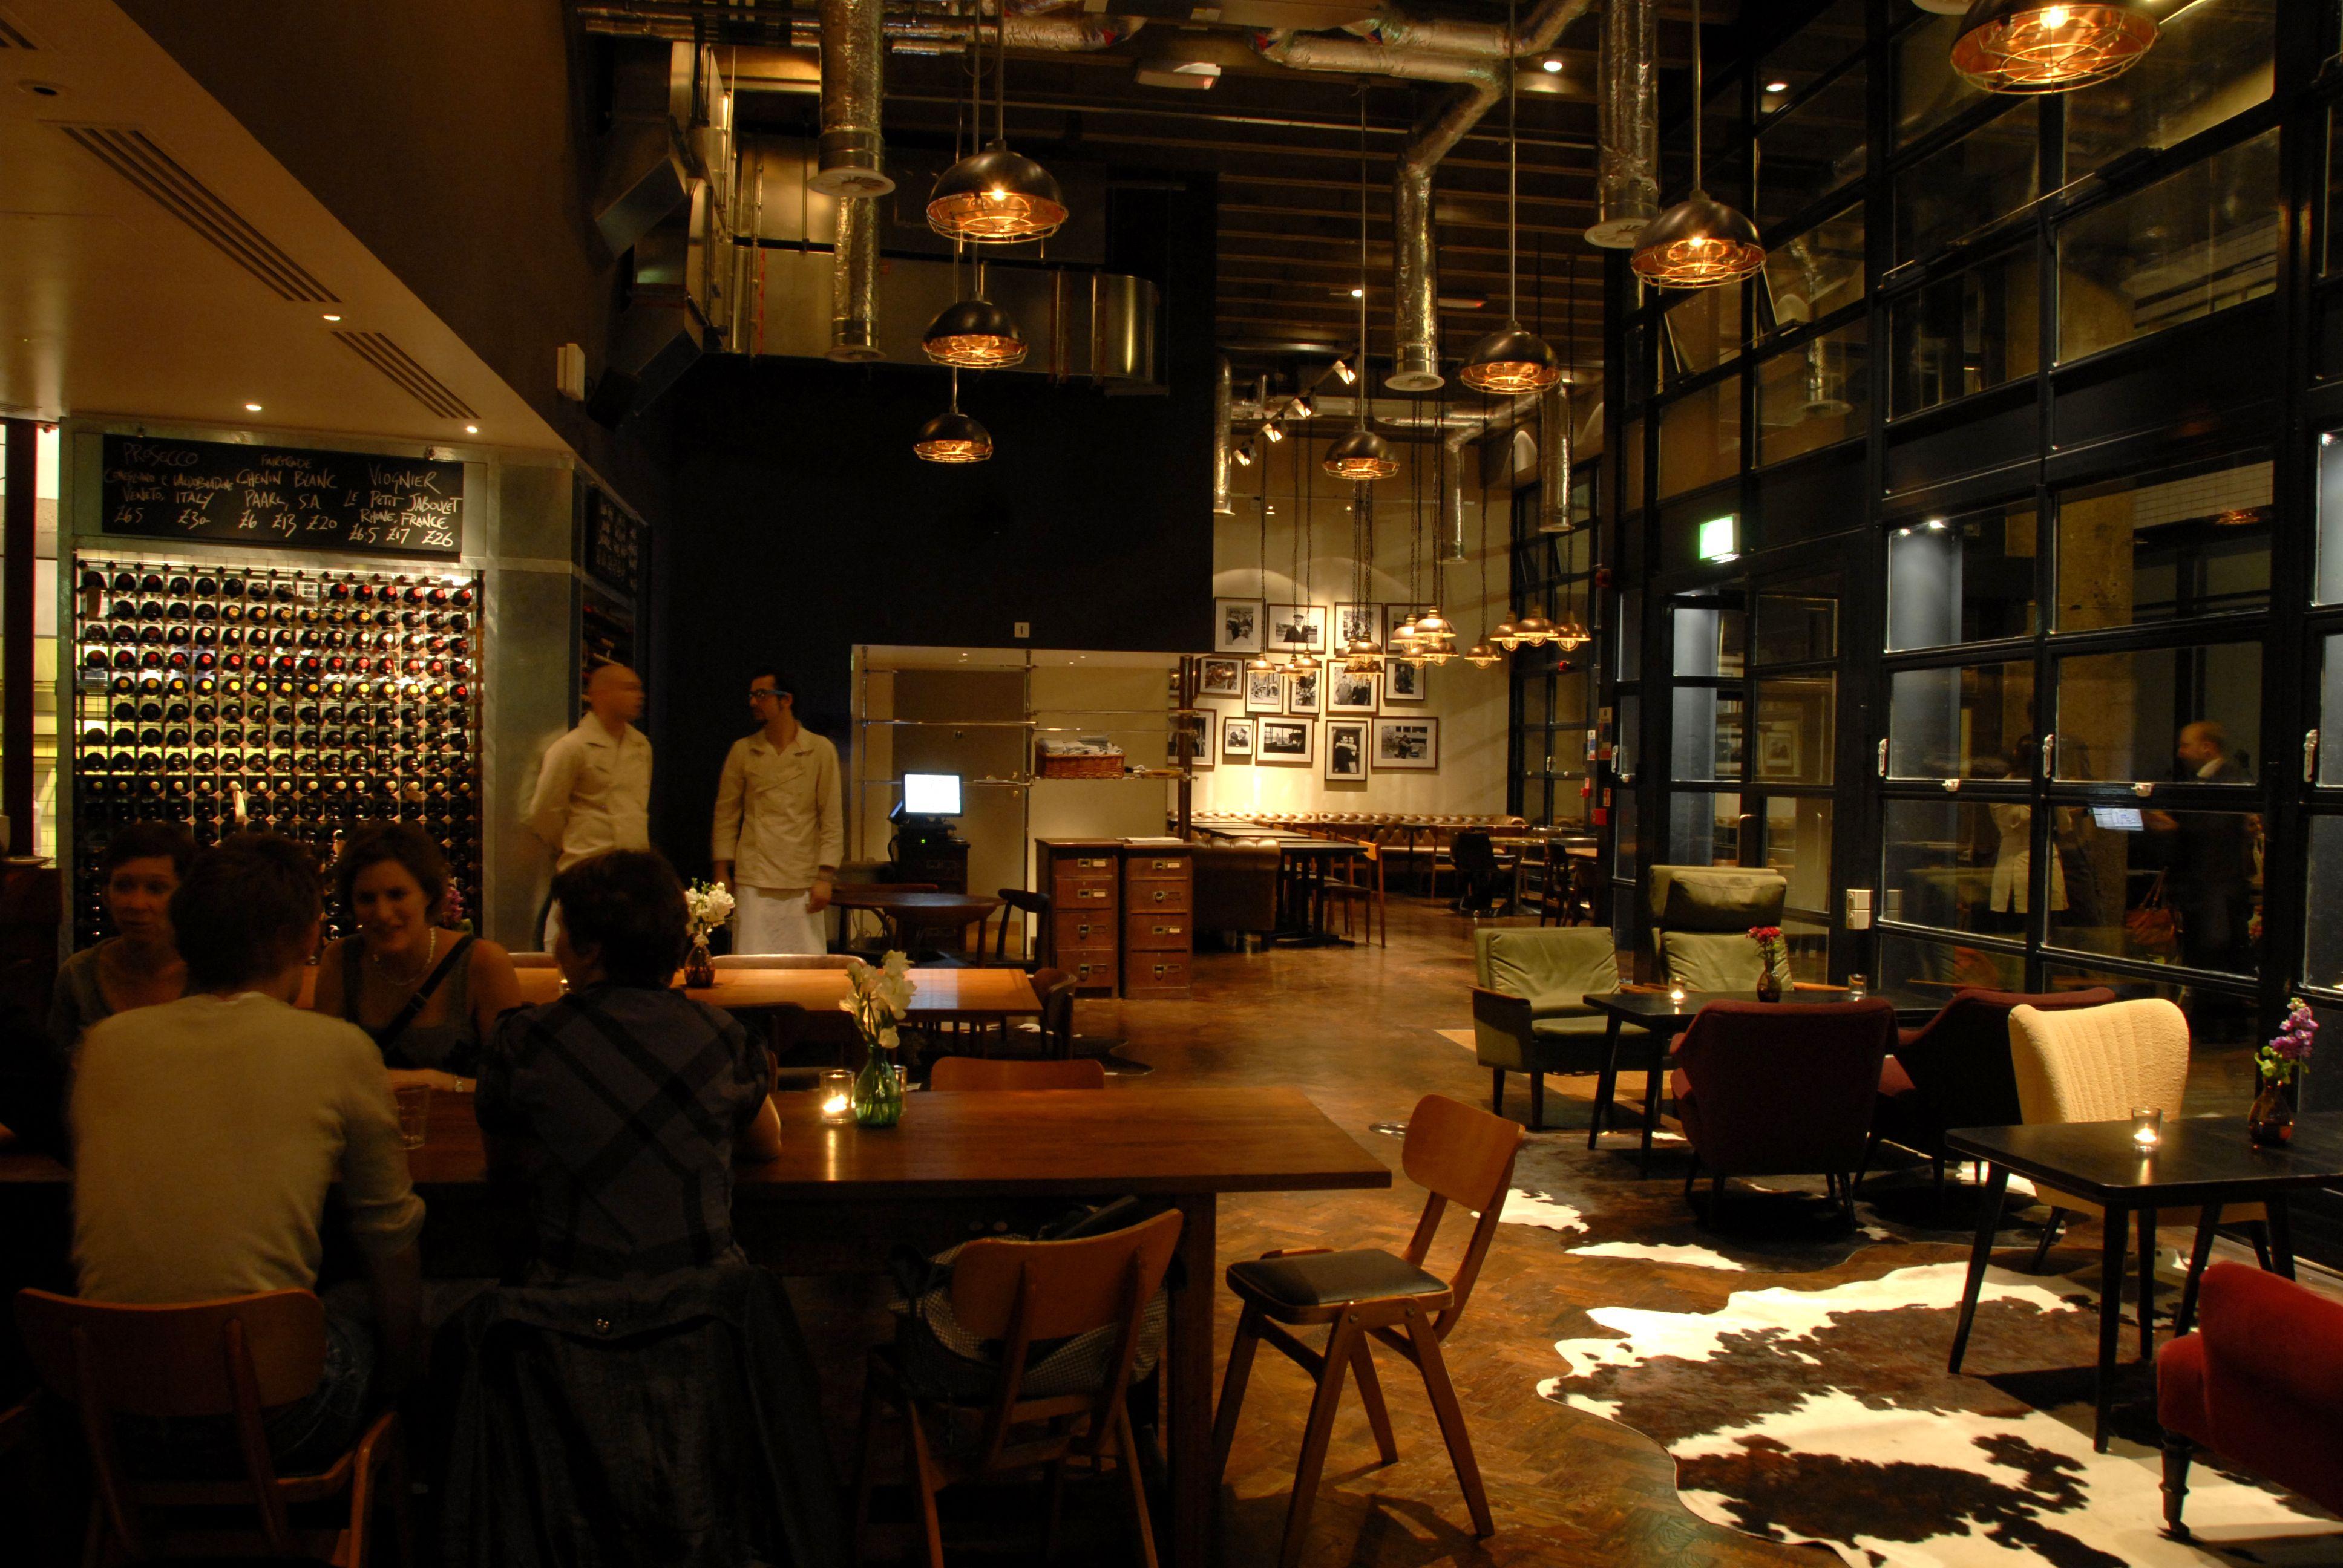 Light + Design - London Wall Bar Kitchen, London | Restaurants and ...